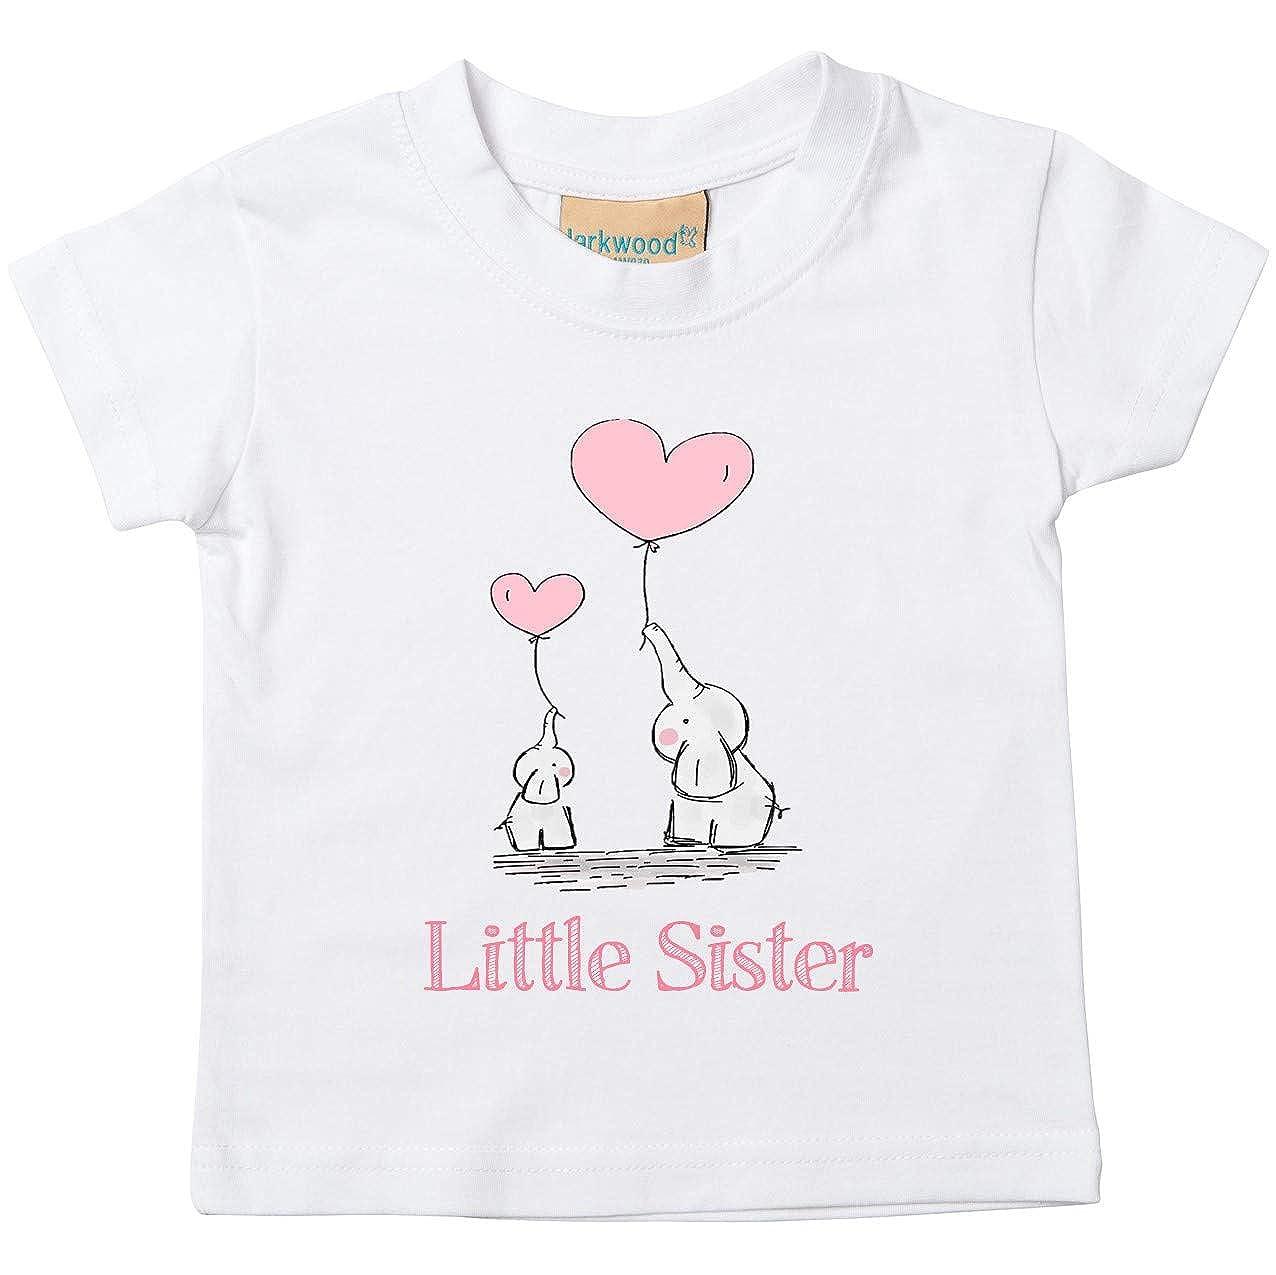 Direct 23 Ltd Big /& Little Sister Wreath T-Shirts /& Bodysuits